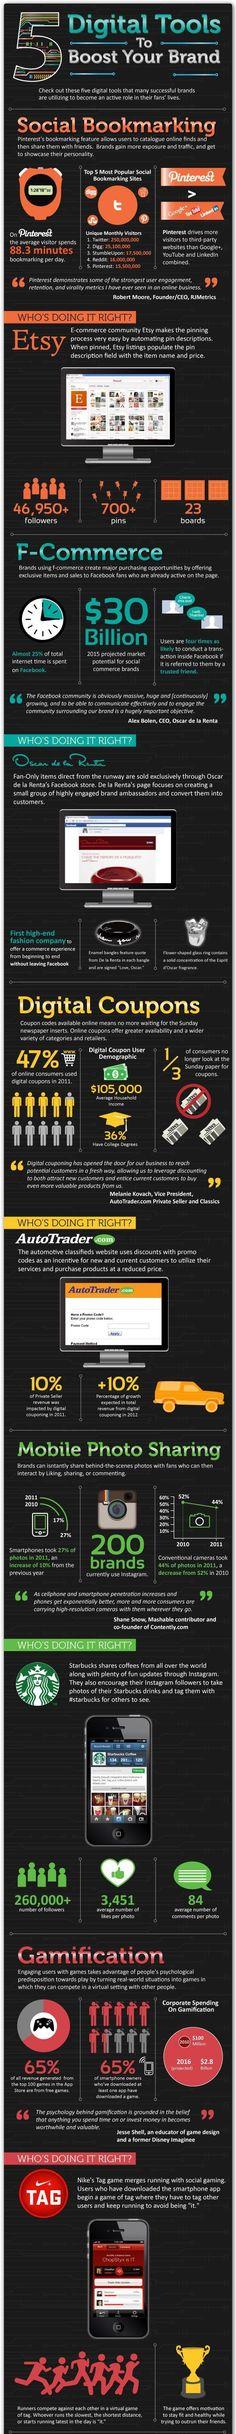 5 tools for Social Media Management.